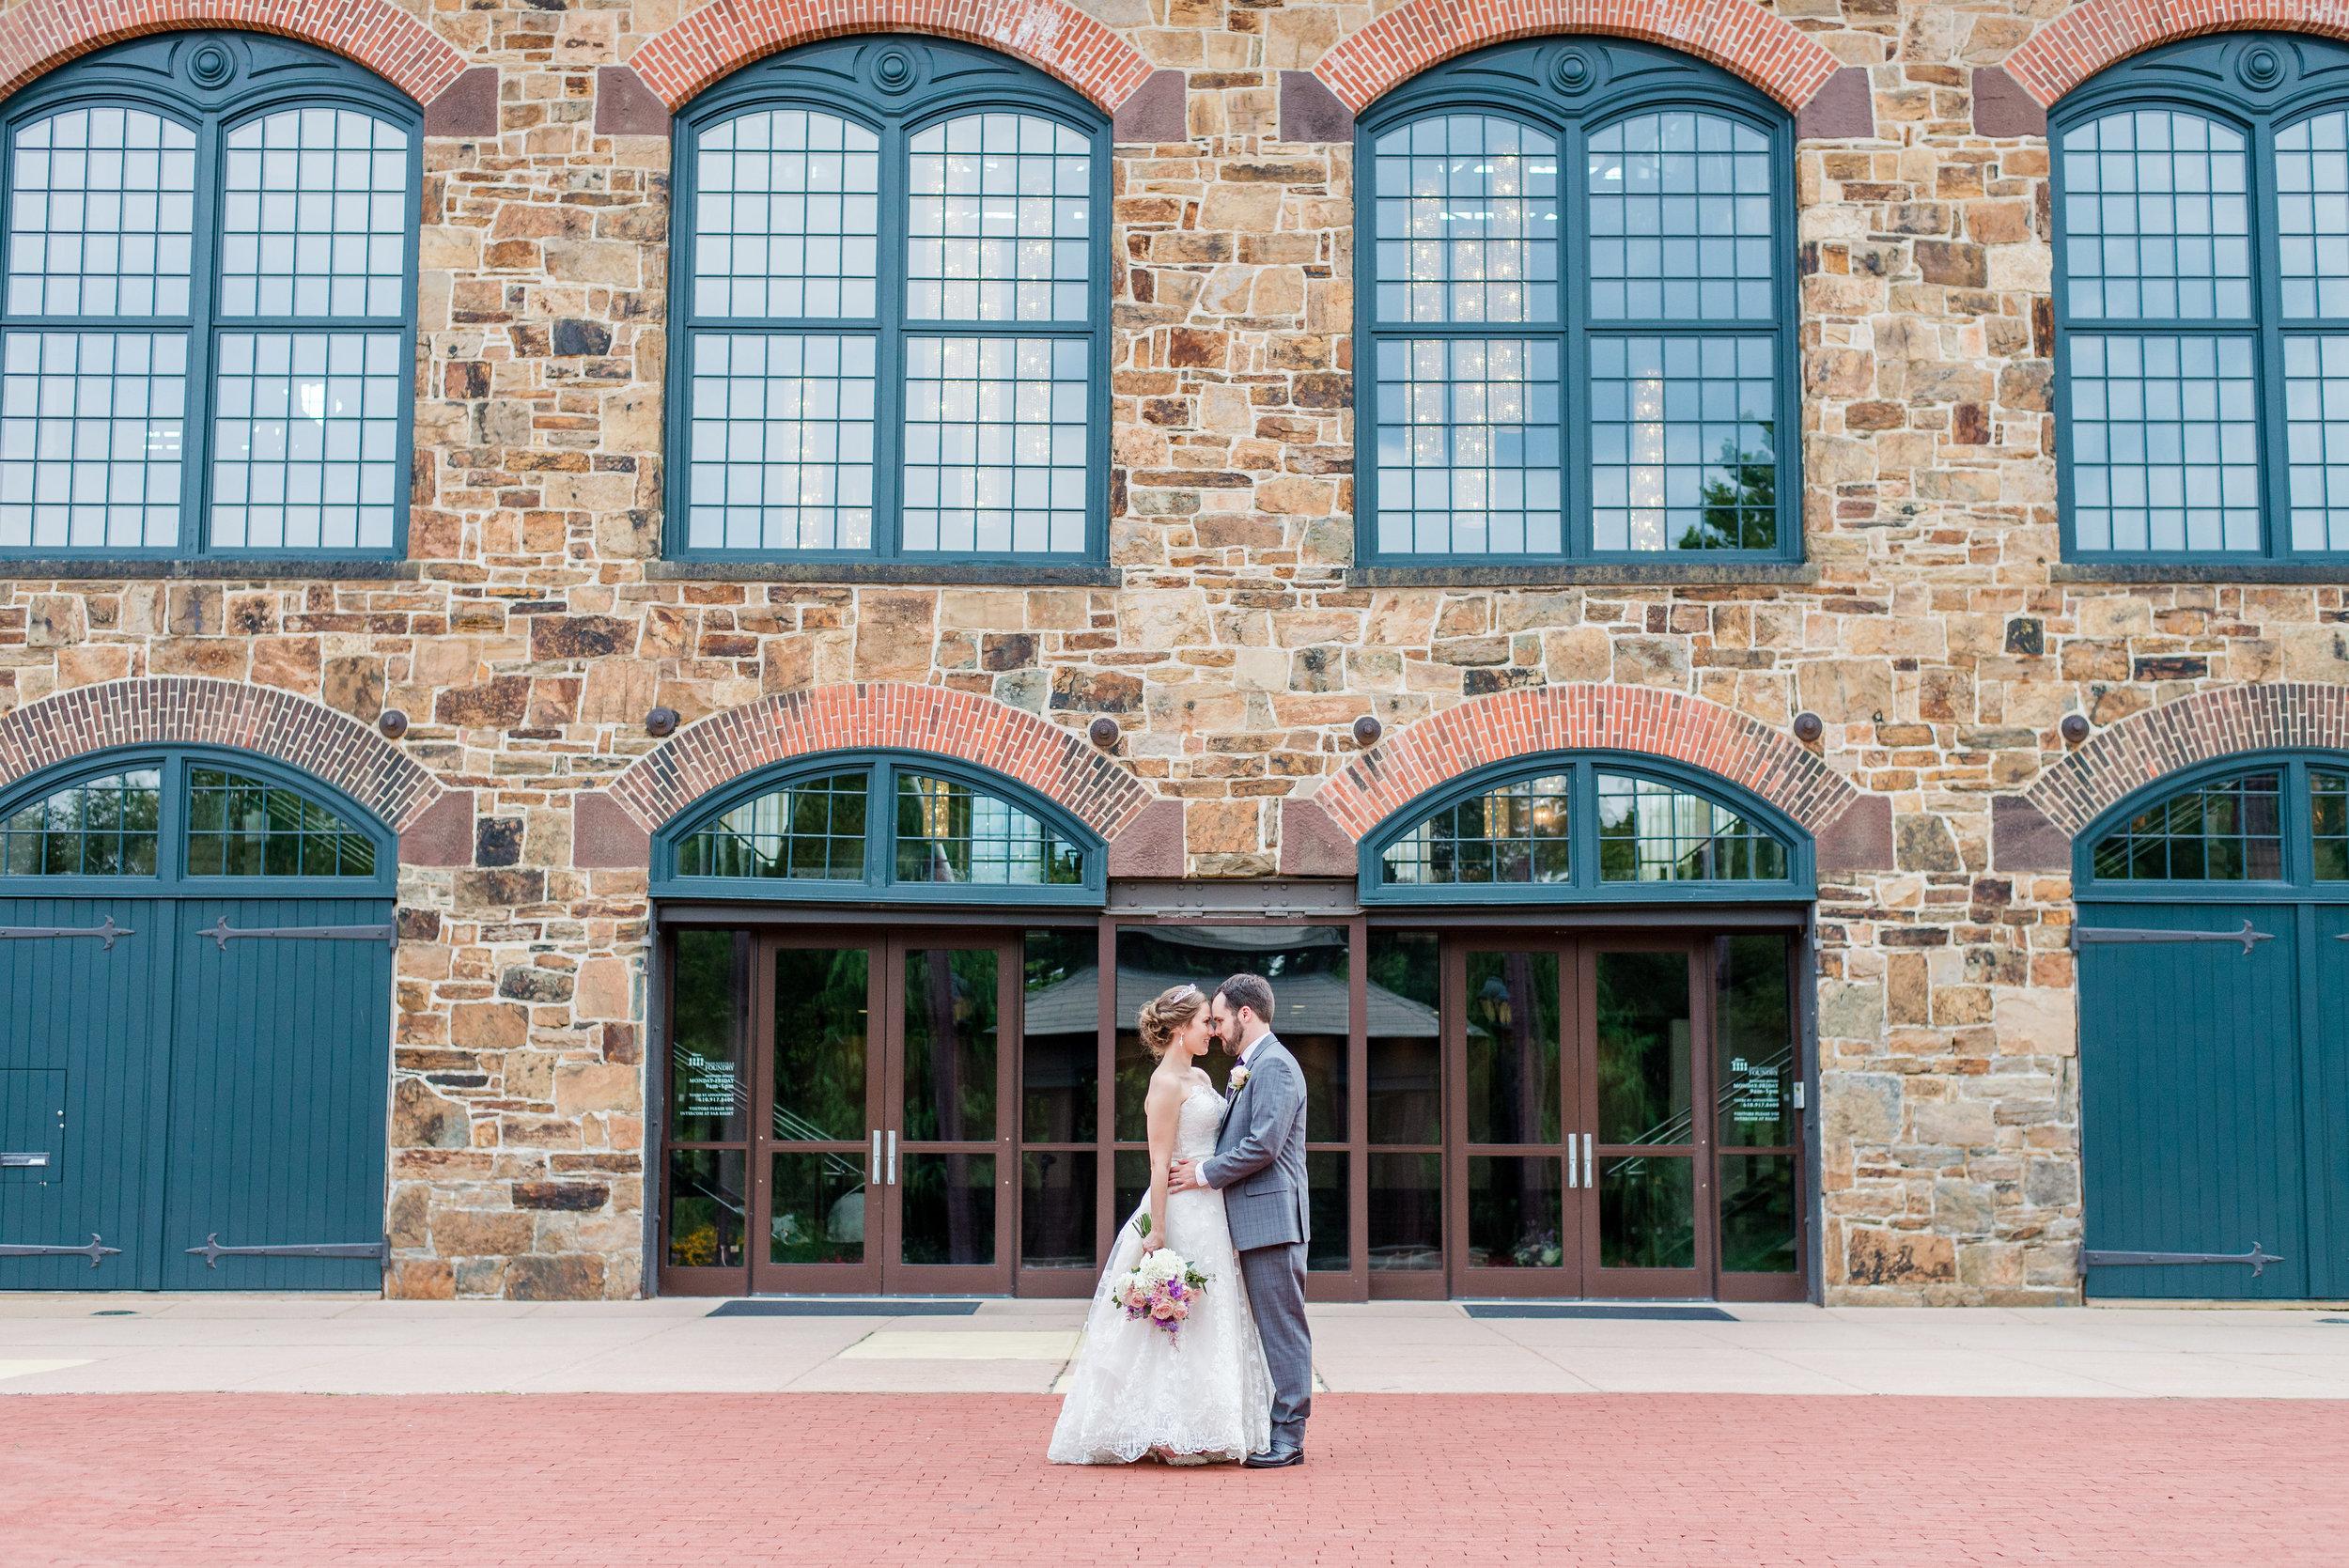 Wedding-Photographer-The-Foundry-Pheonixville-Pennsylvania-Andrea-Krout-Photography-262.jpg